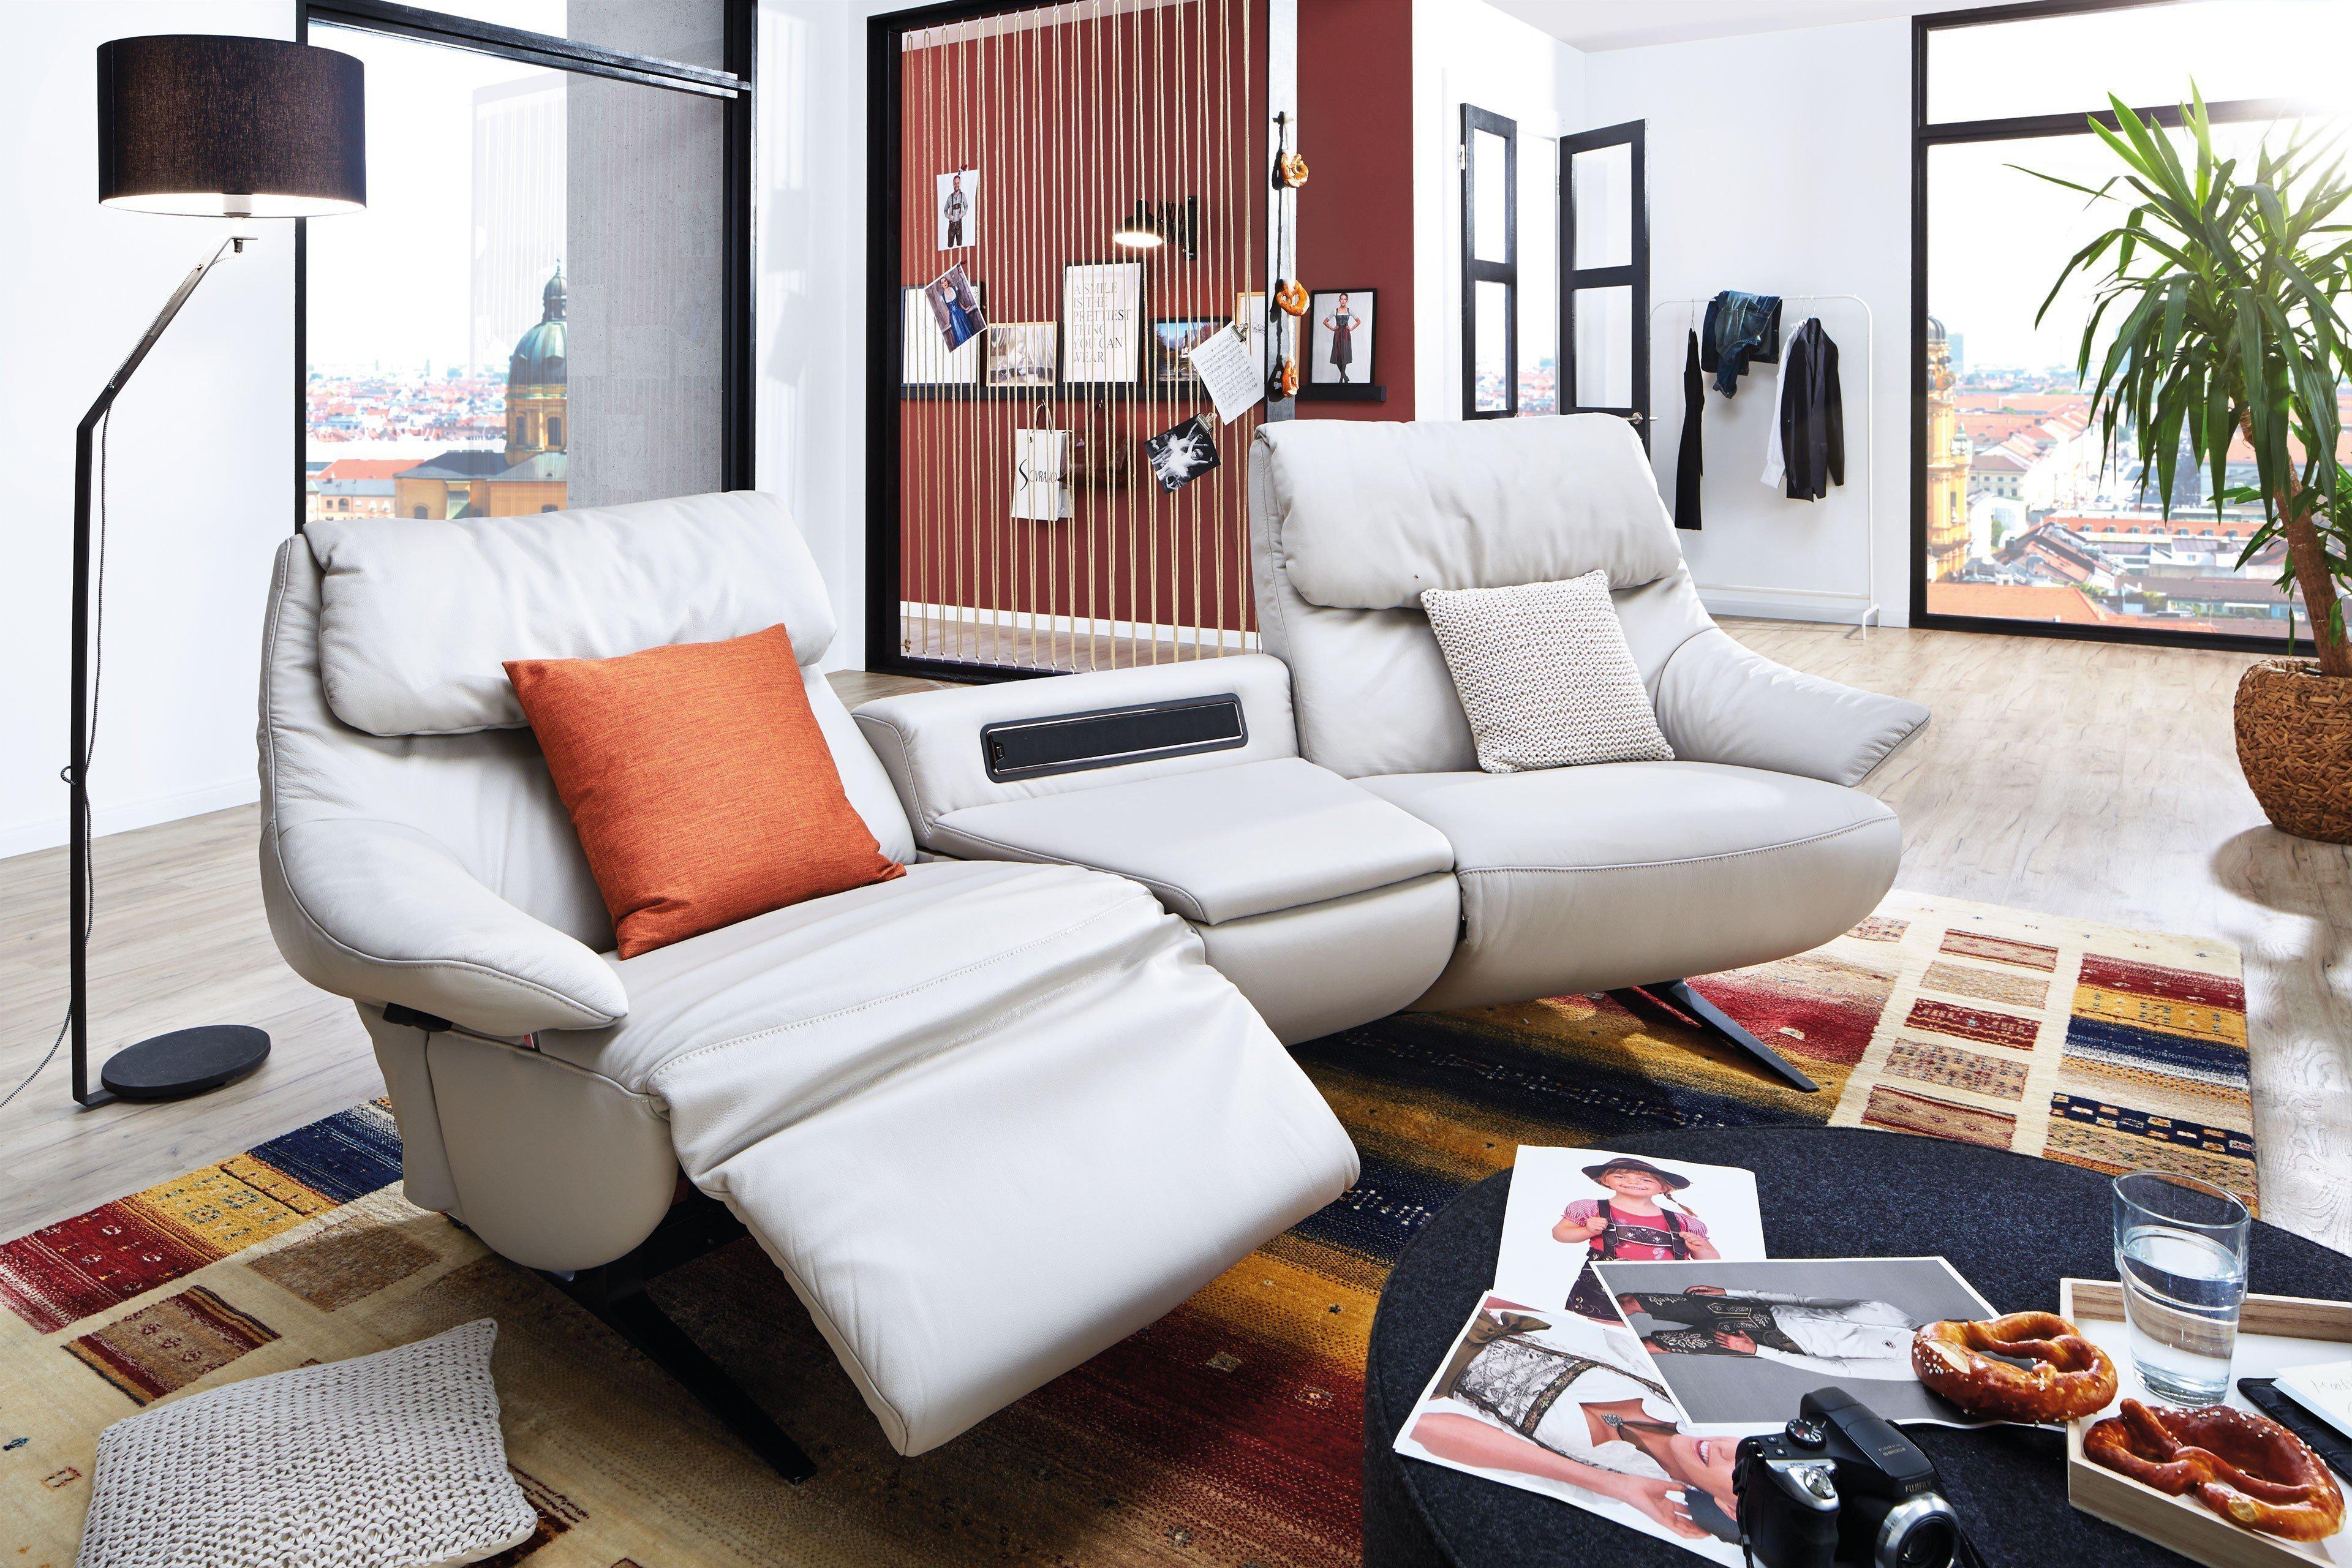 himolla polsterm bel 4602 trapezsofa in hellgrau m bel. Black Bedroom Furniture Sets. Home Design Ideas